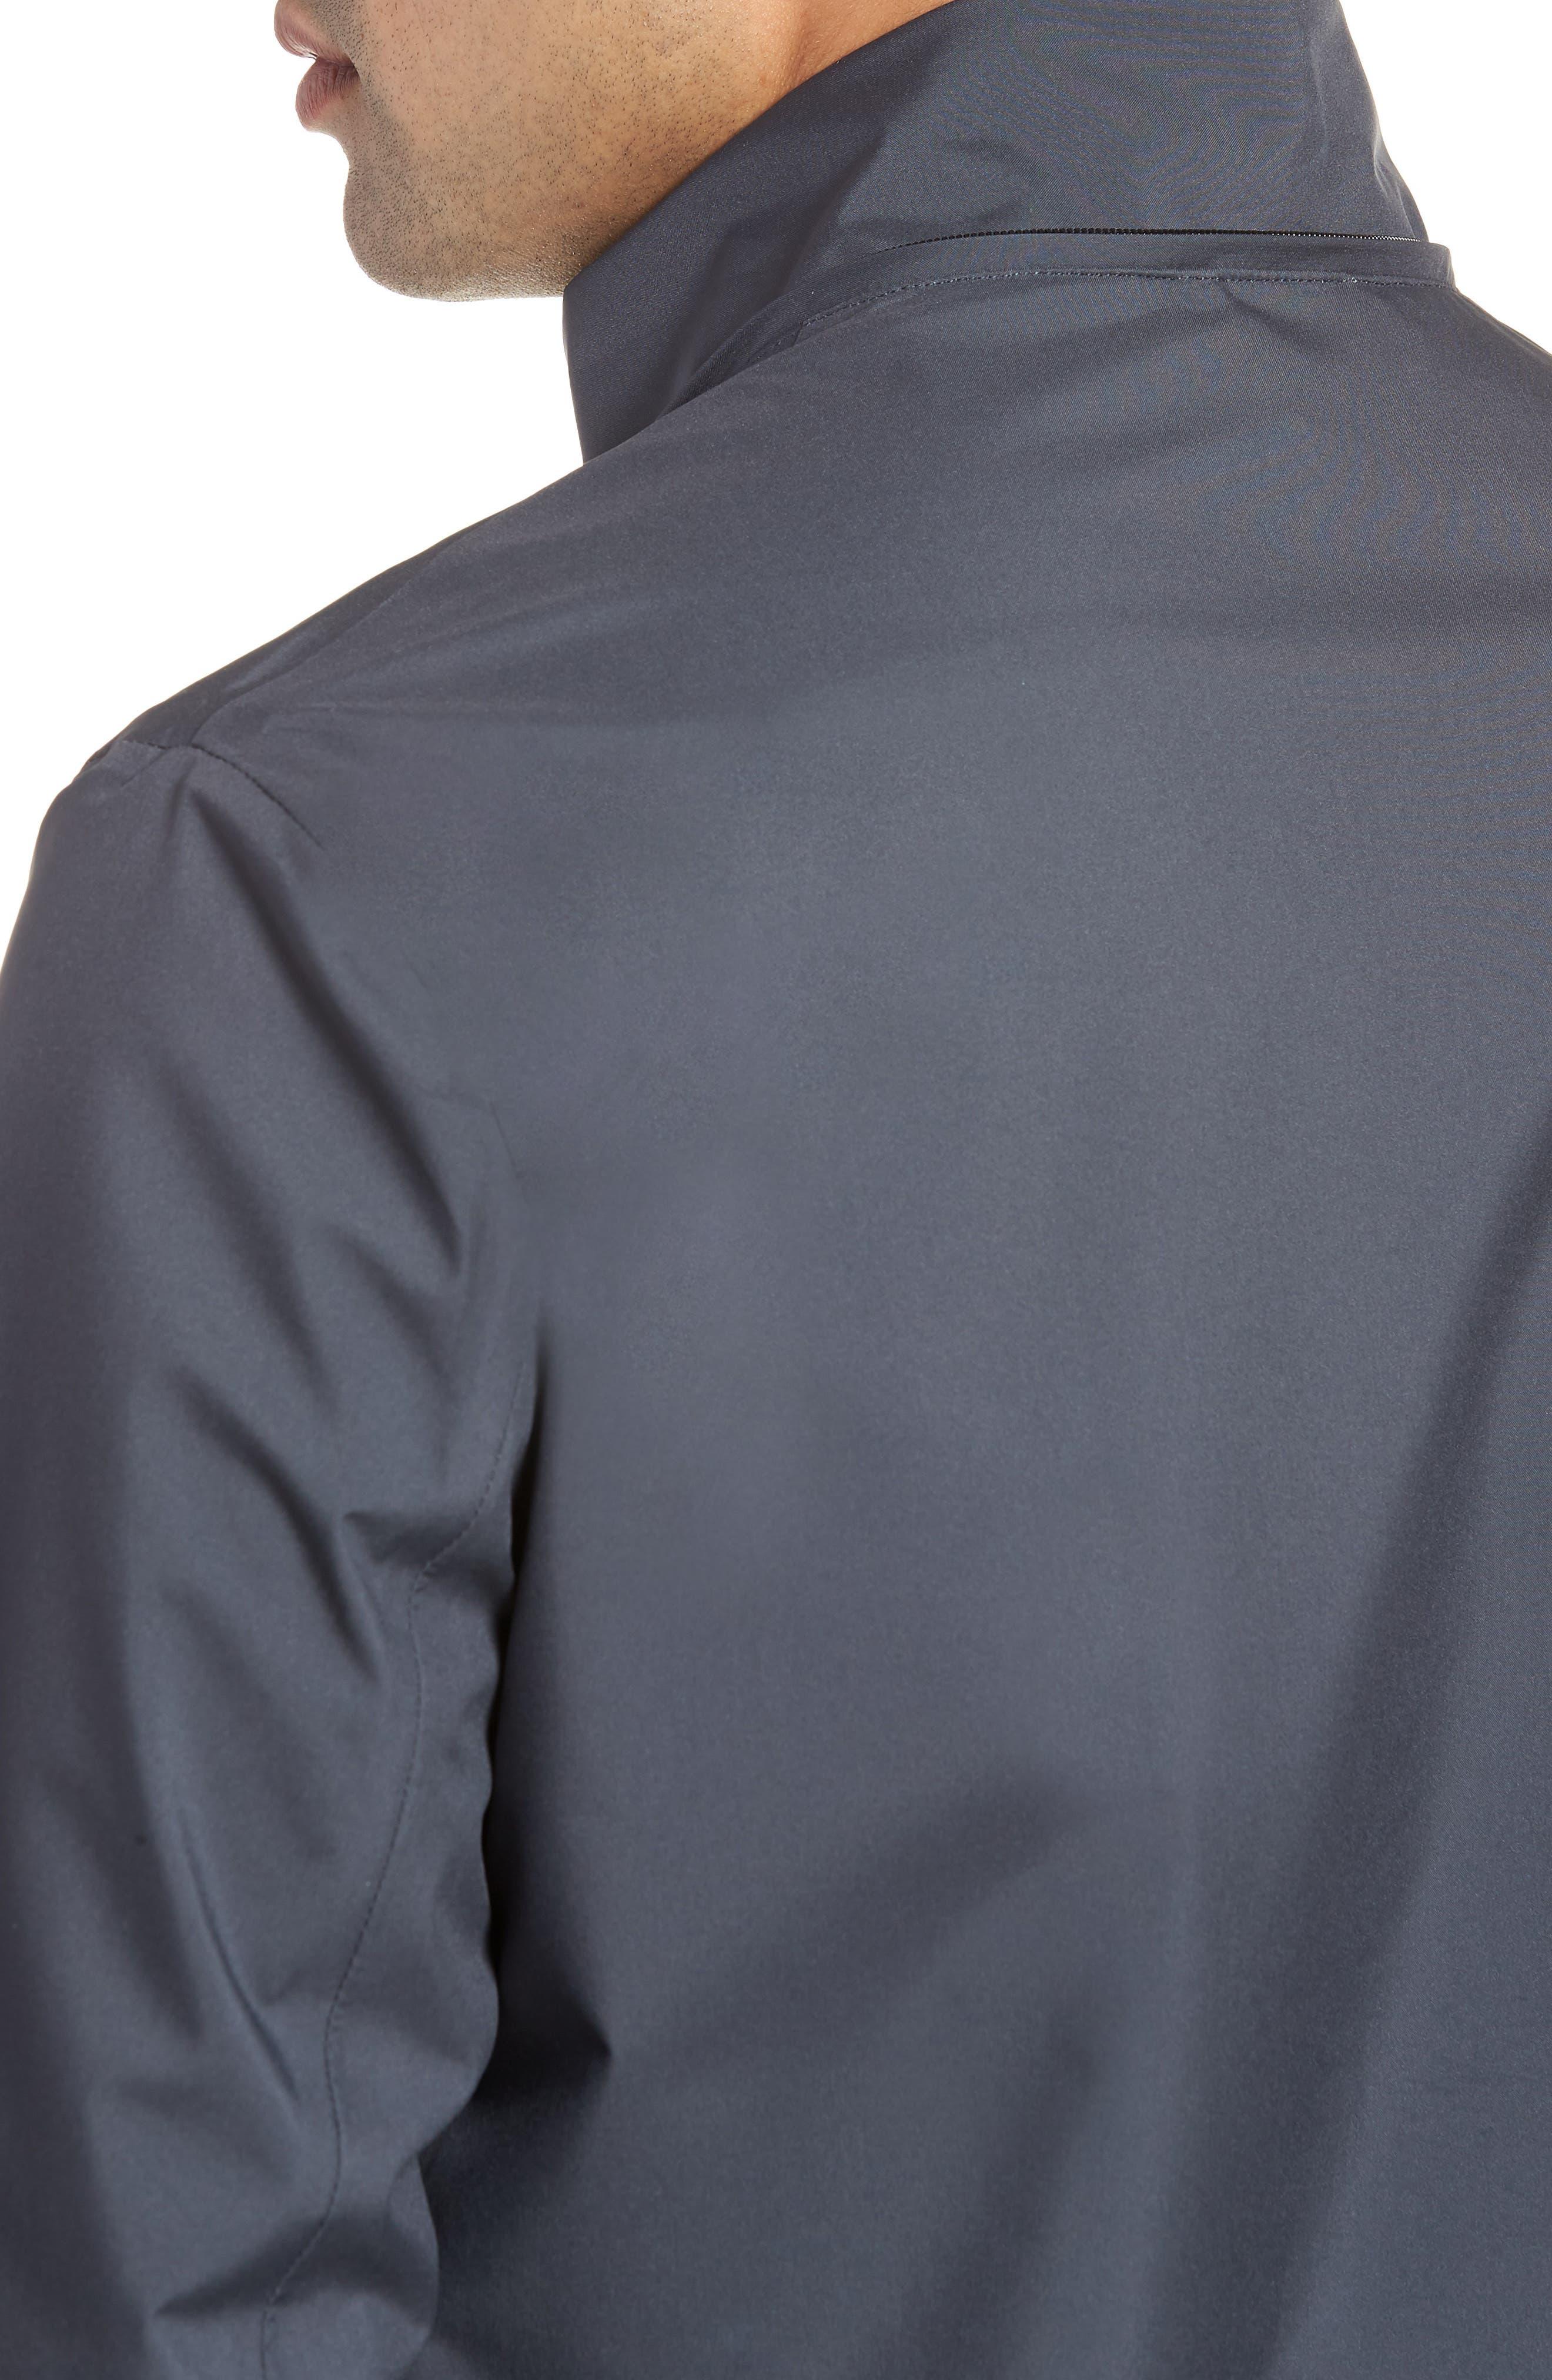 Regular Fit Jacket,                             Alternate thumbnail 4, color,                             Slate